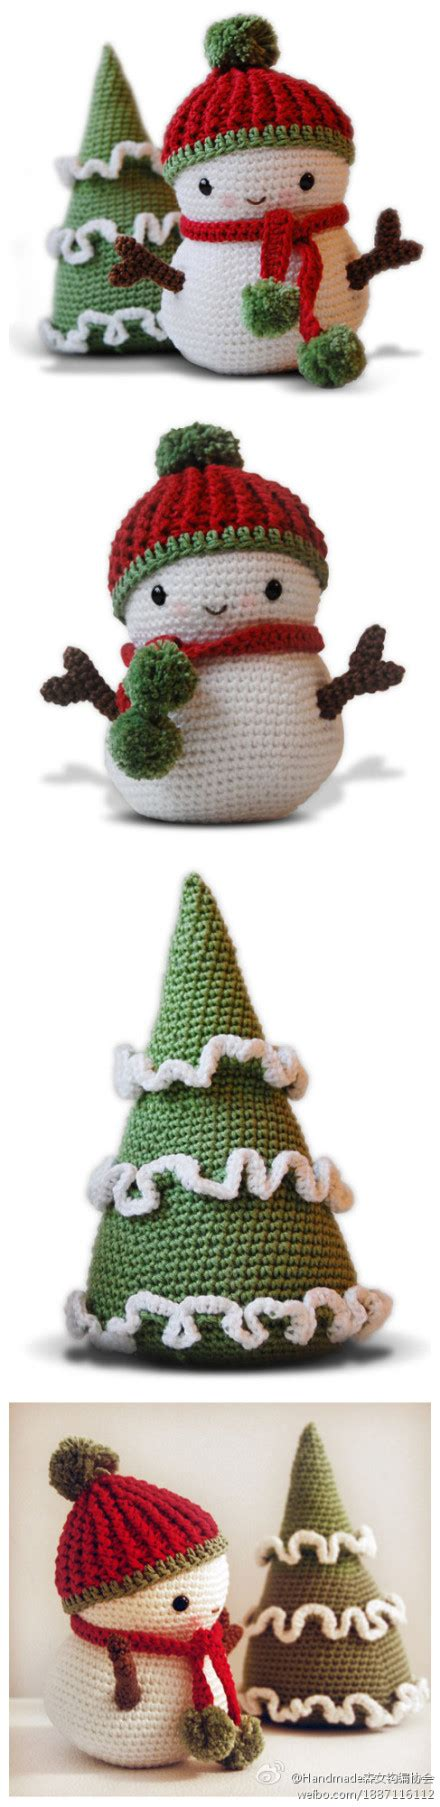 frosty snowman christmas tree ideas frosty the snowman and tree by pepika crochet snowman tree